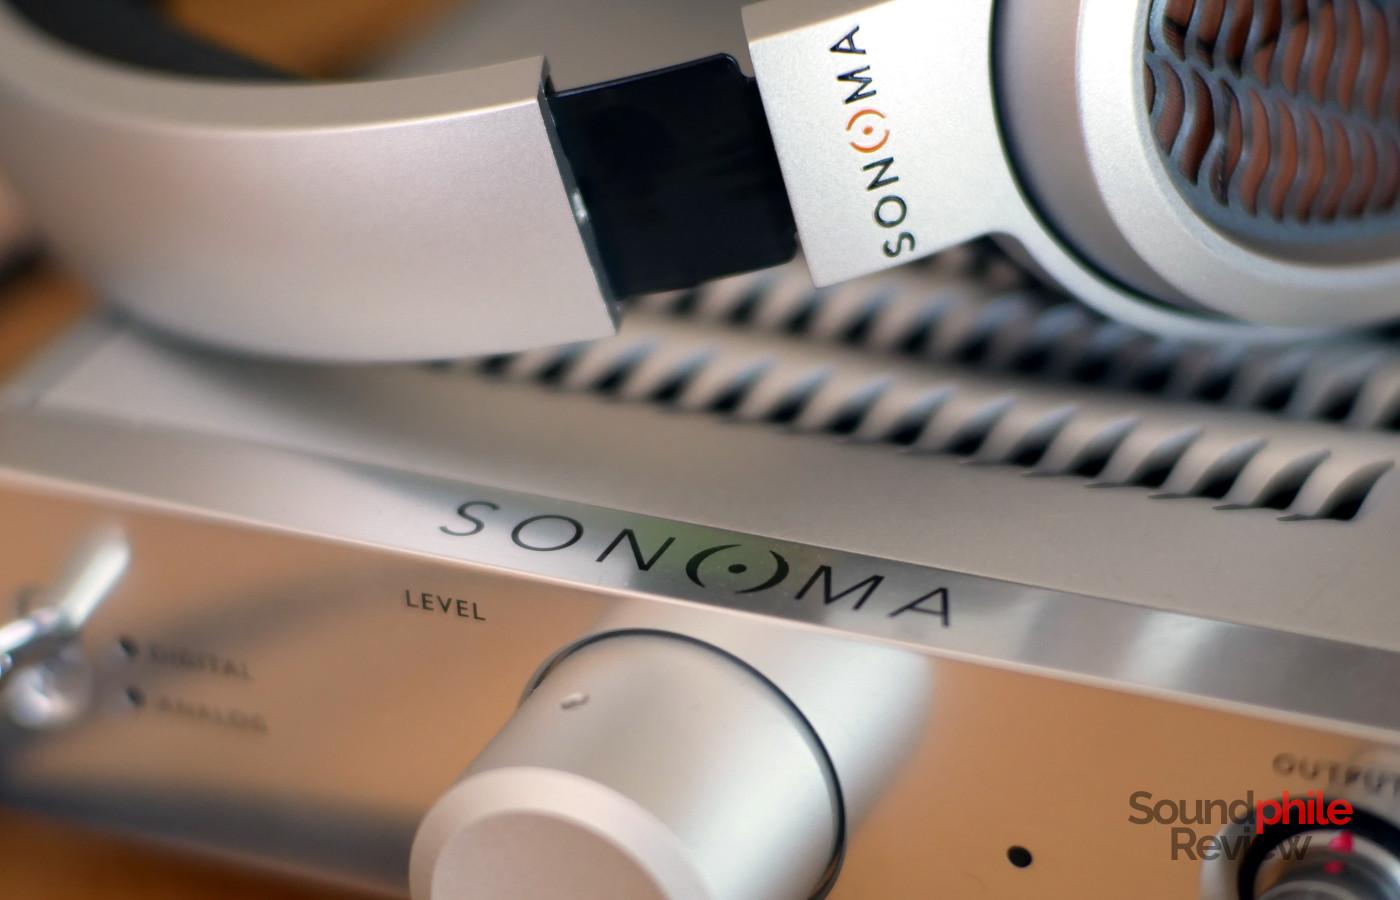 Warwick Acoustics Sonoma M1 Headphones in Pictures